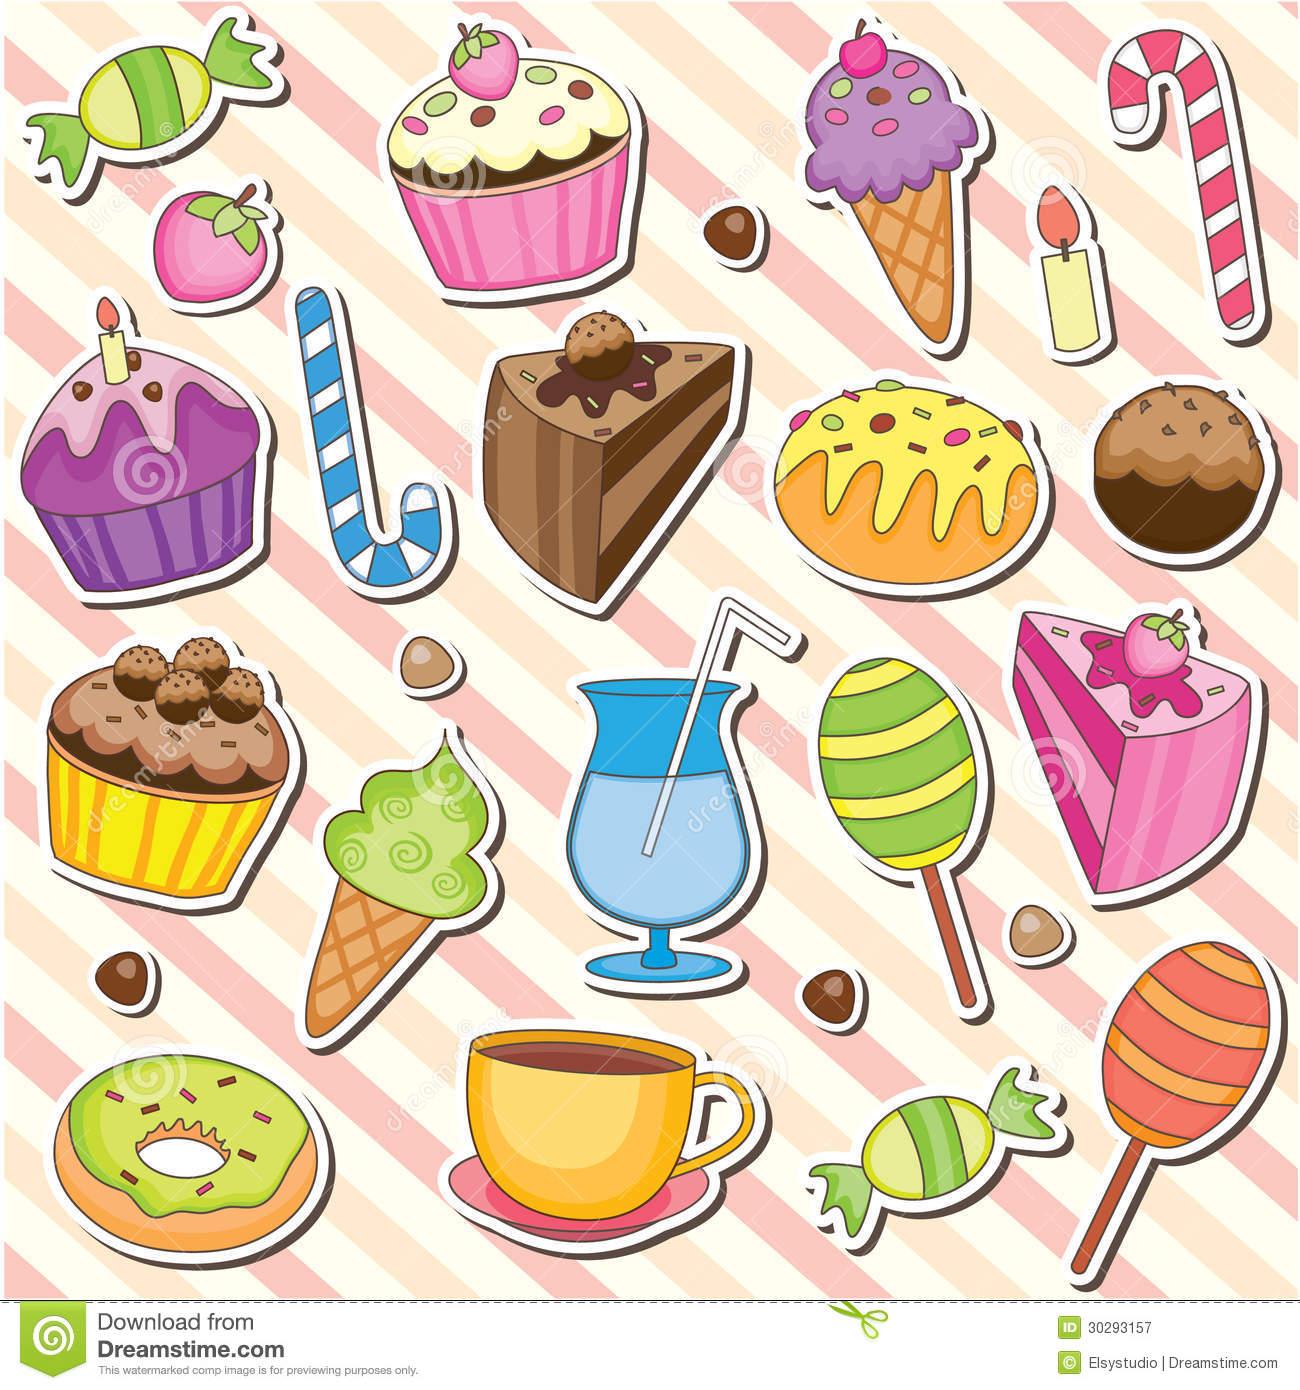 Clipart dessert gratuit banner freeuse download Clipart dessert gratuit - ClipartFest banner freeuse download